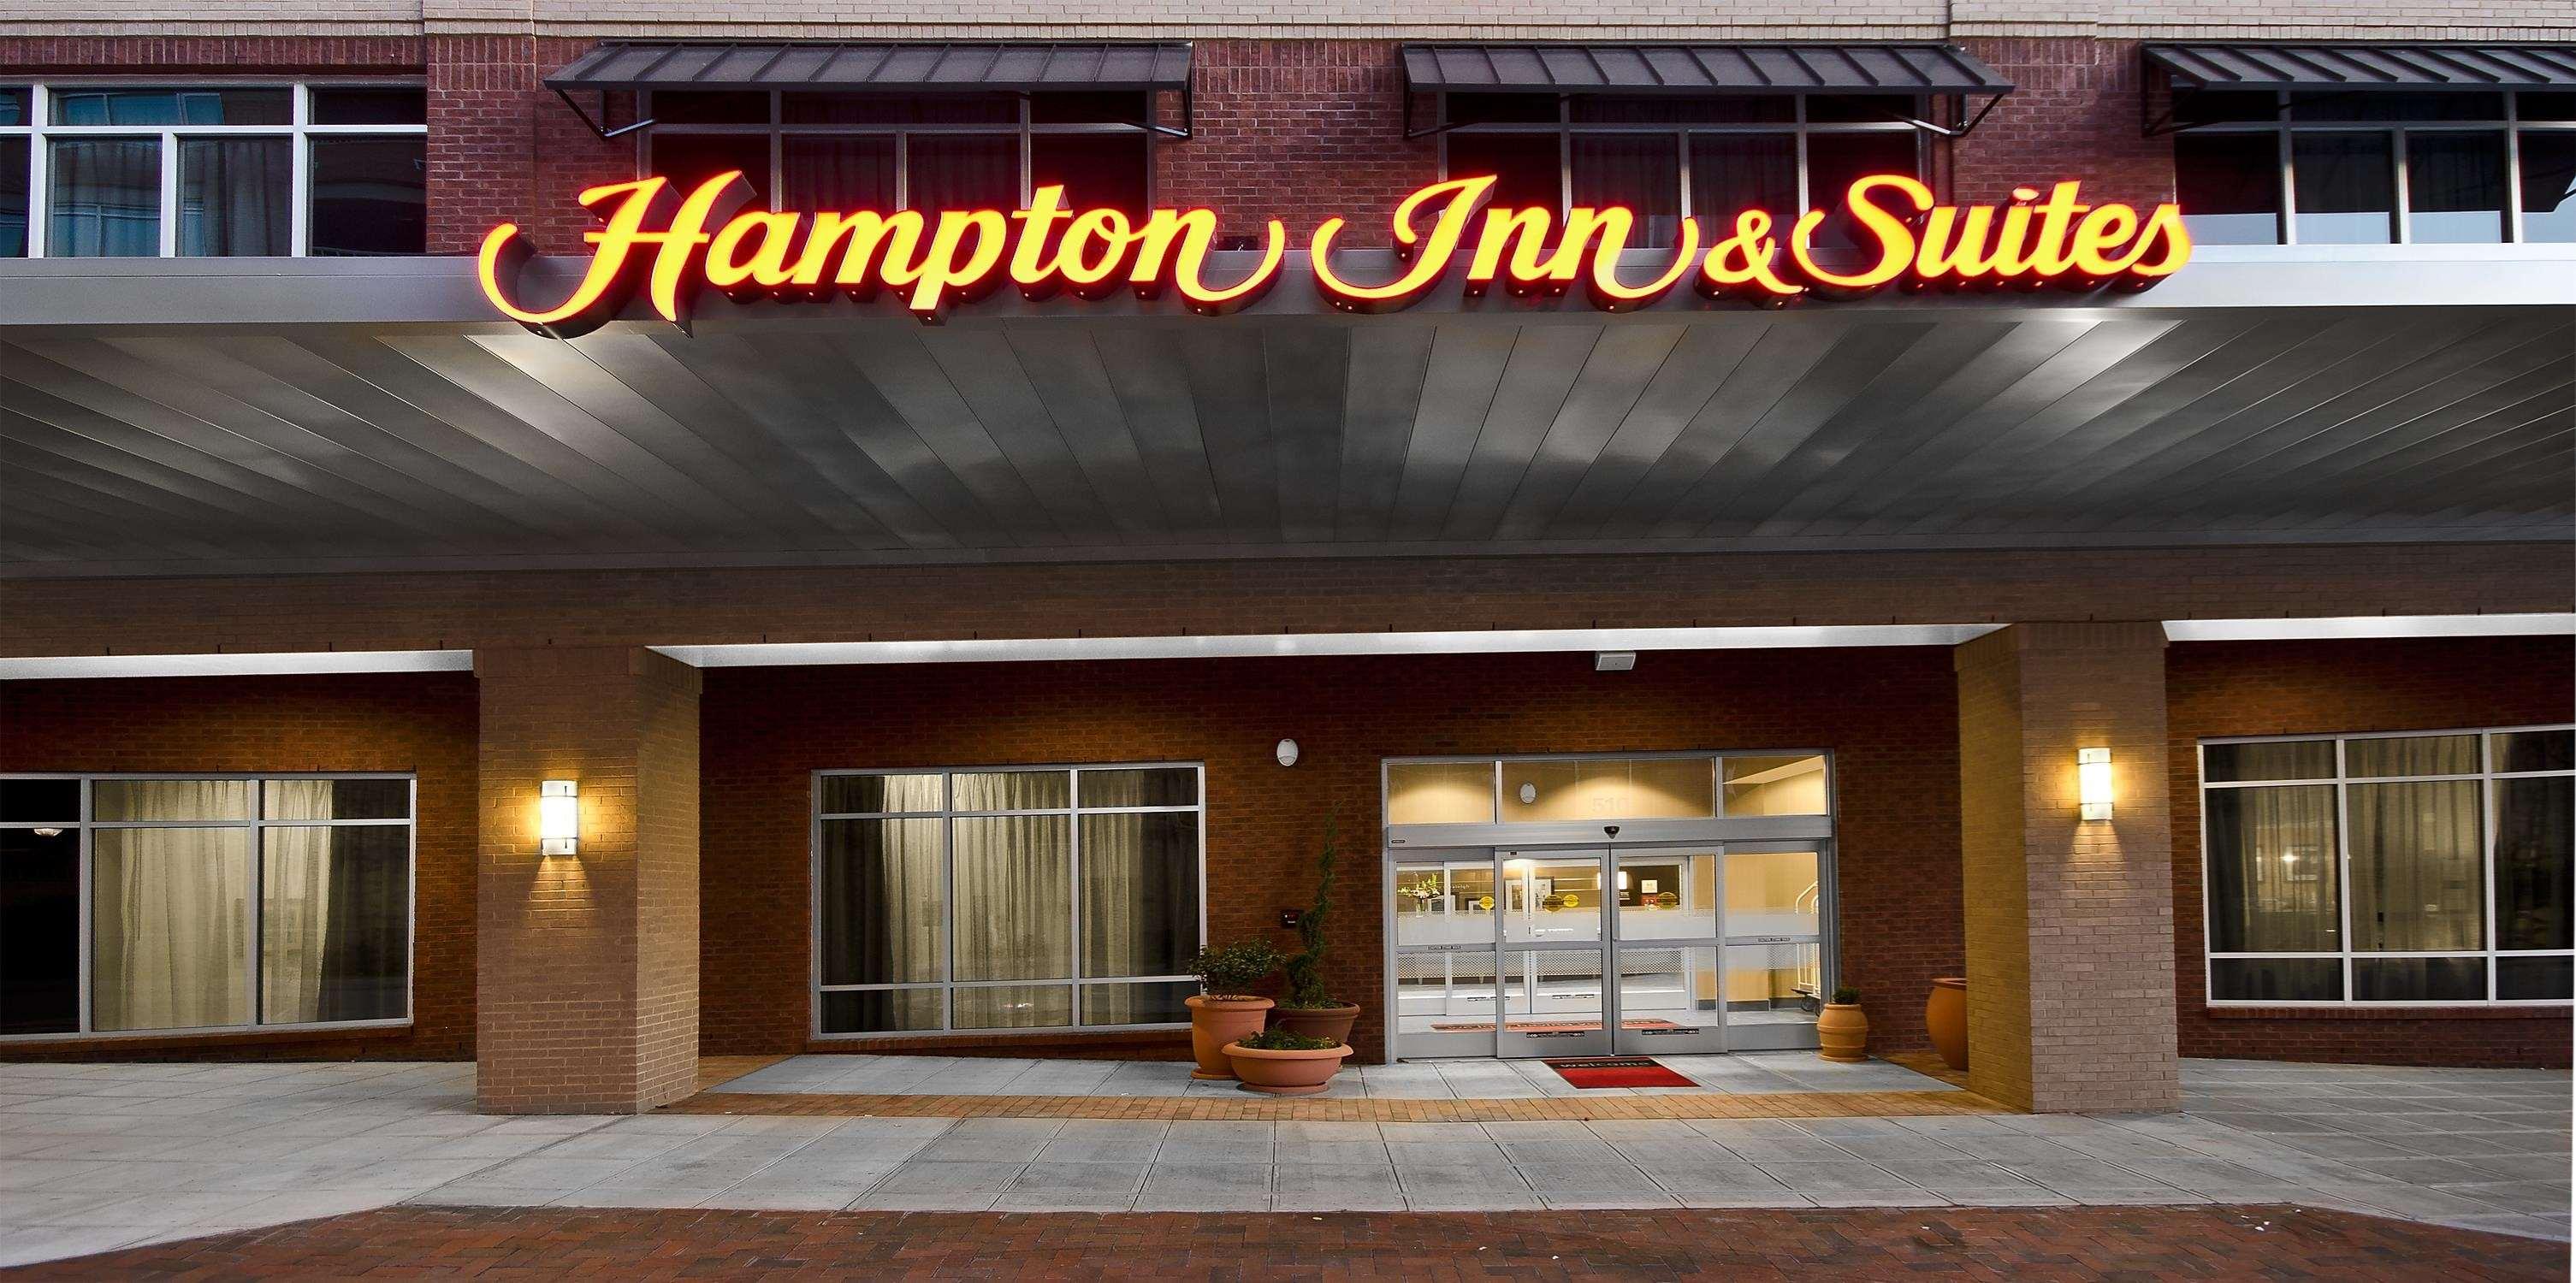 Hampton Inn & Suites Raleigh Downtown image 1